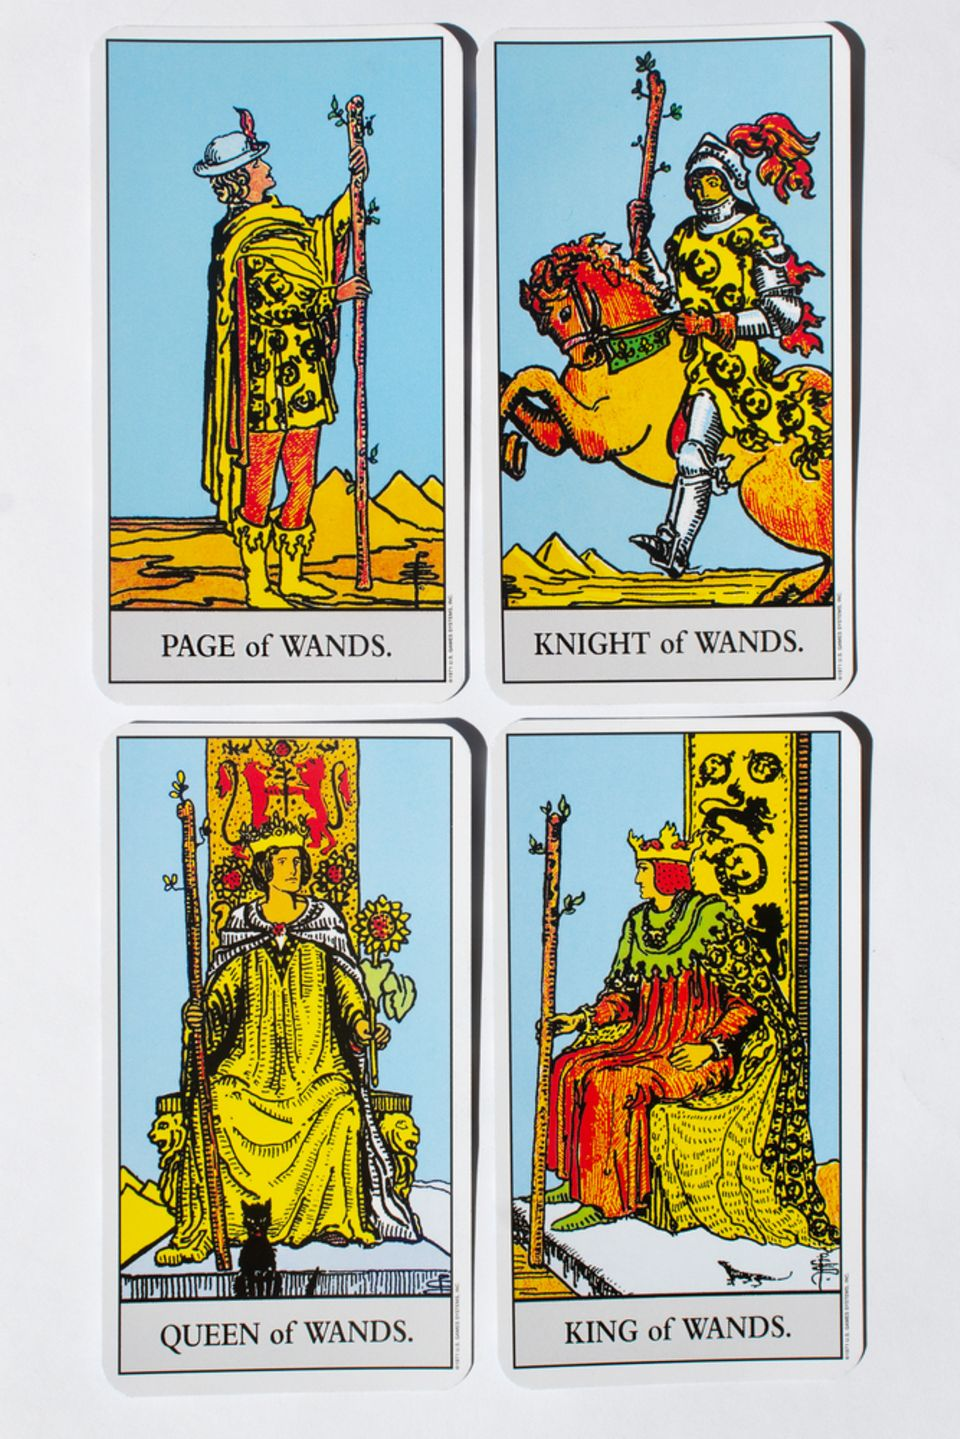 Tarotkarten-Bedeutung: Das verbirgt sich hinter den 78 Karten